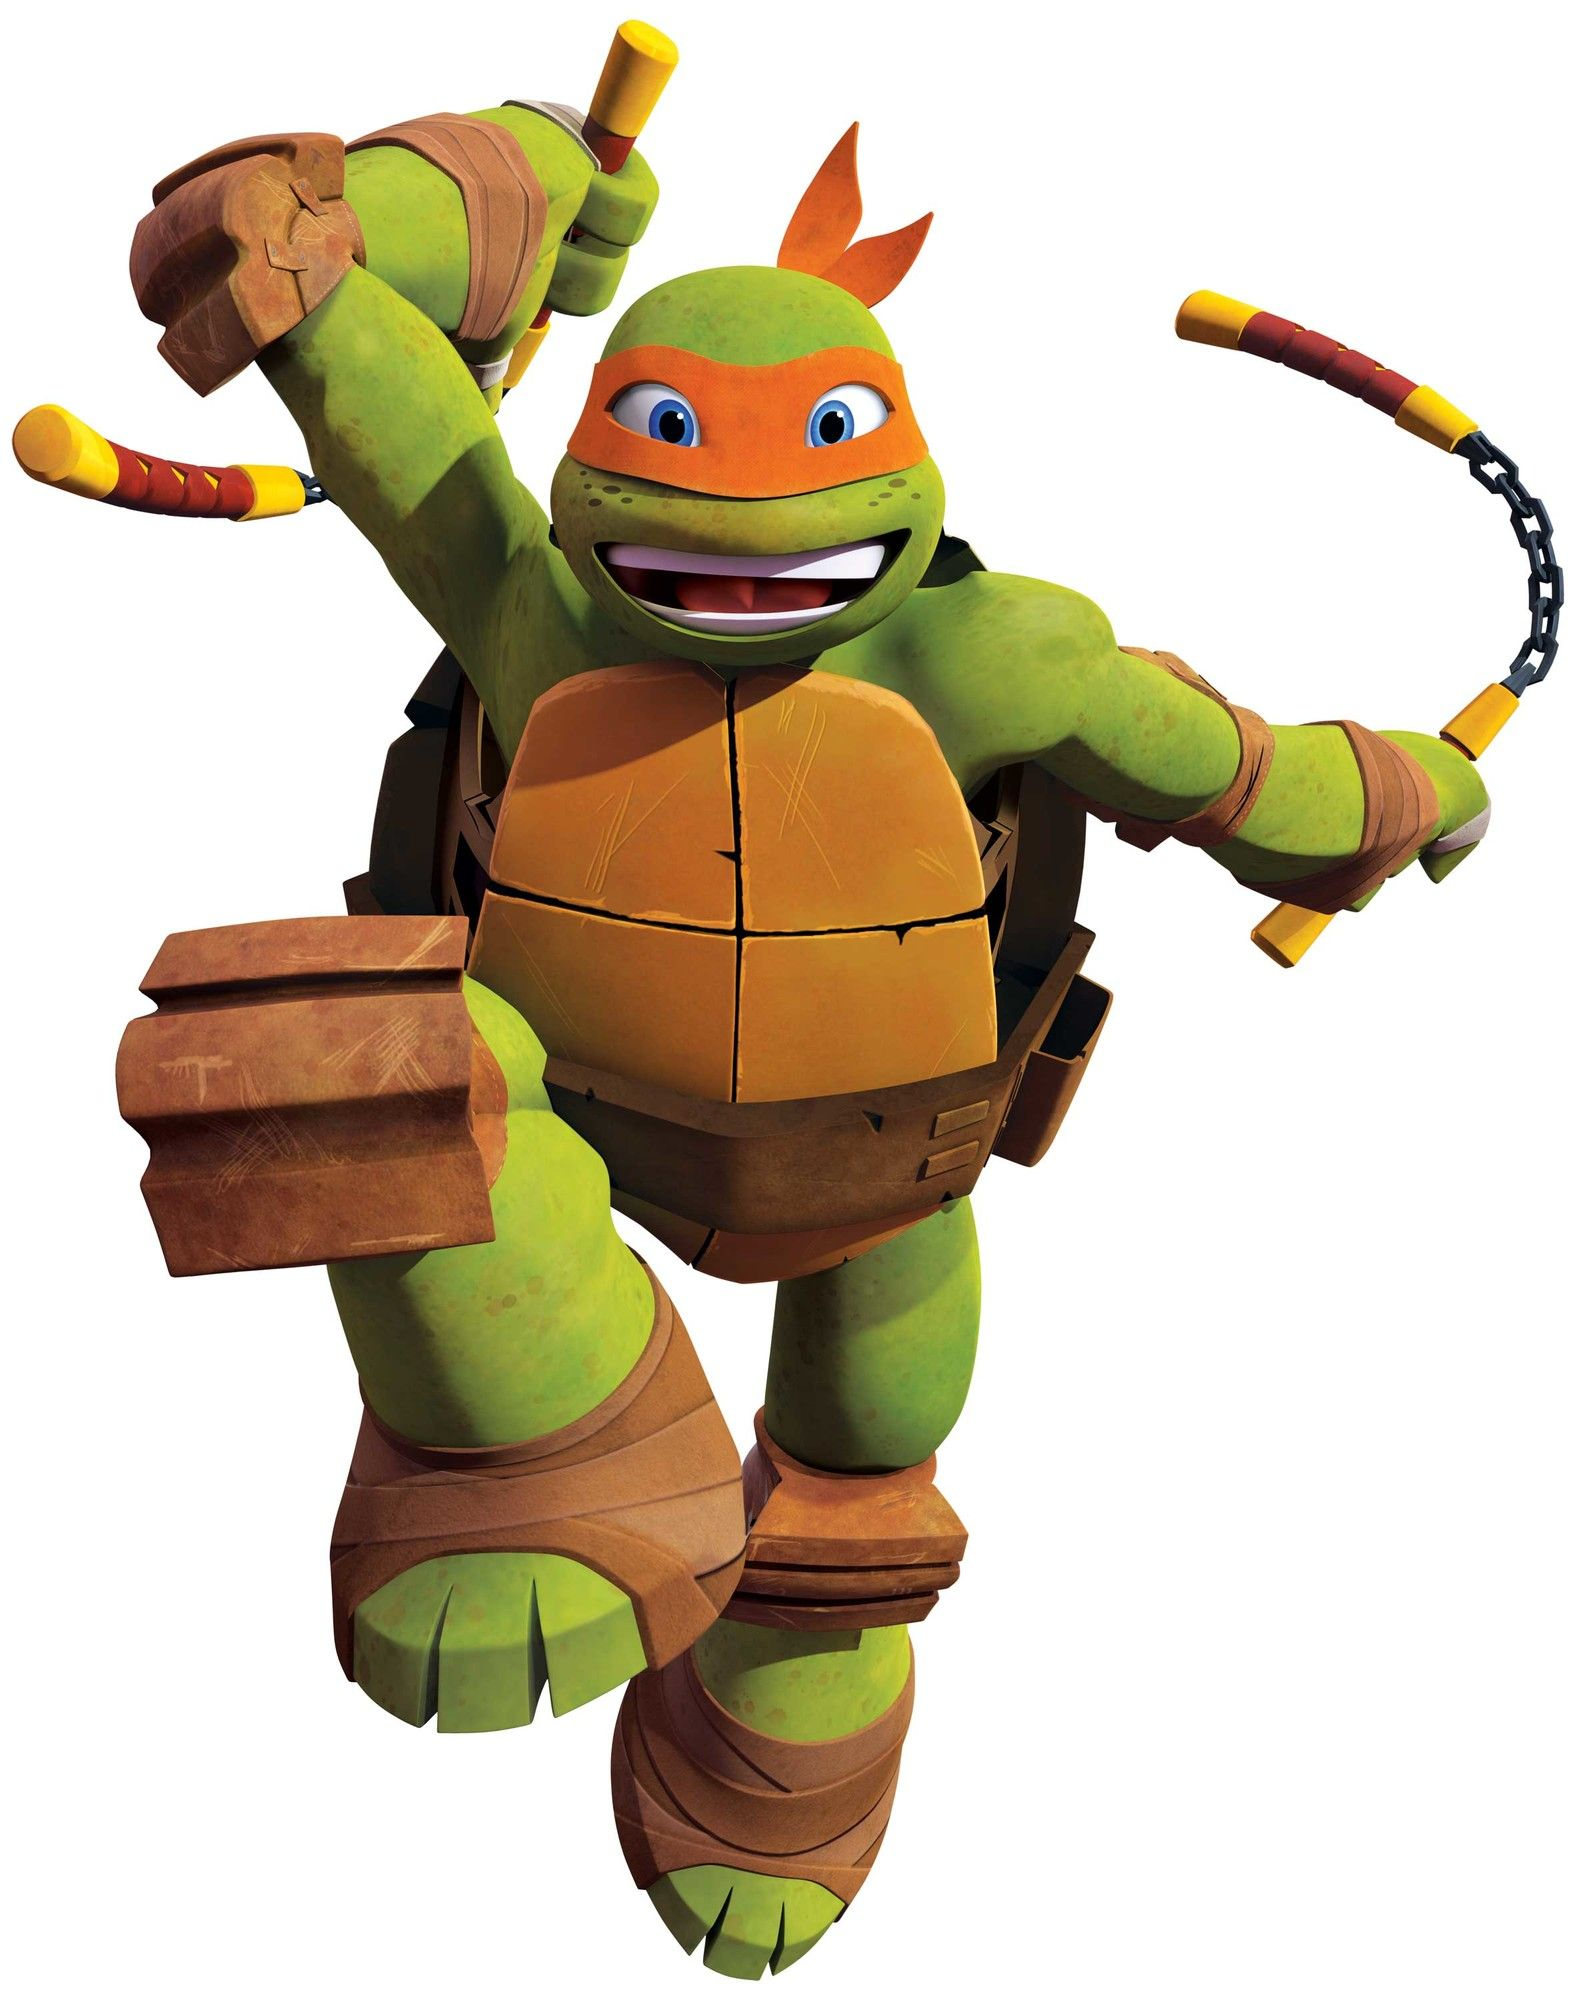 Teenage Mutant Ninja Turtles Michelangelo Wall Decal Ninja Turtles Ninja Turtle Decorations Ninja Turtle Party